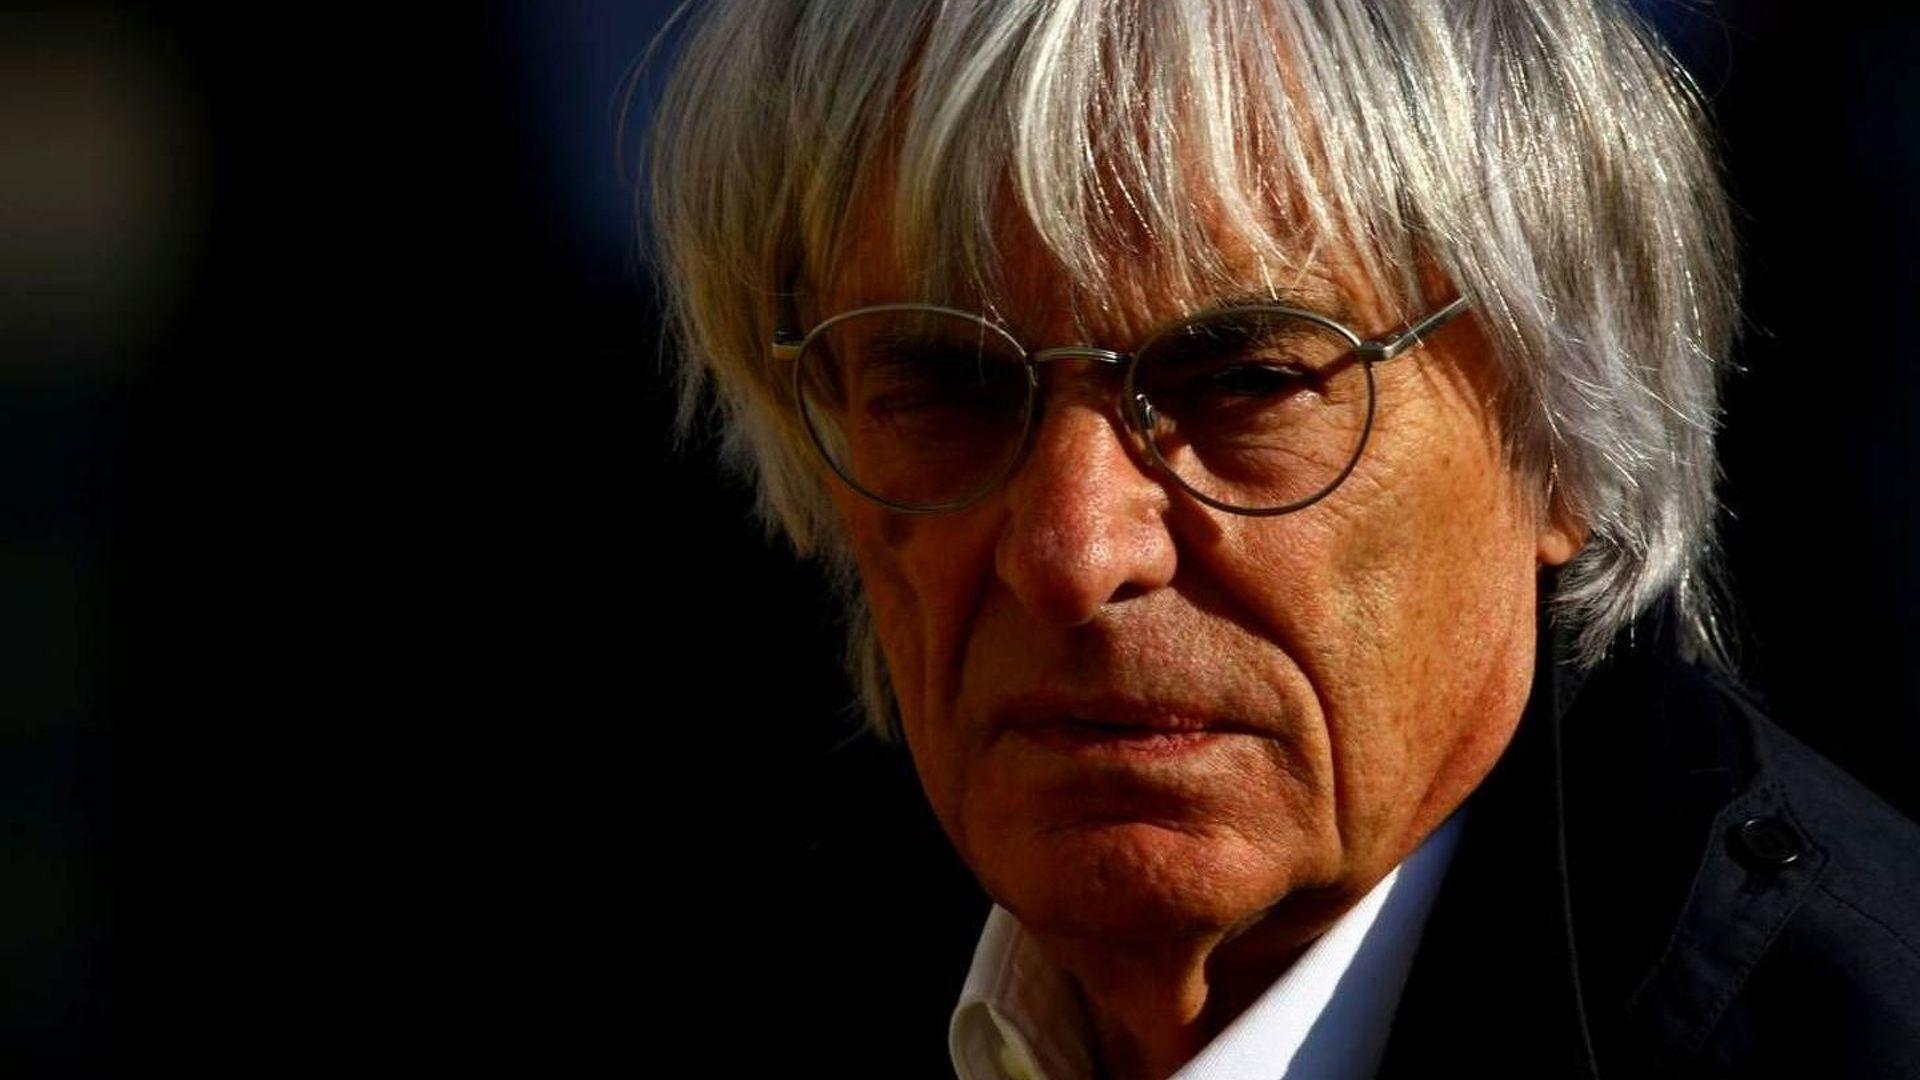 F1 doesn't need British GP - Ecclestone